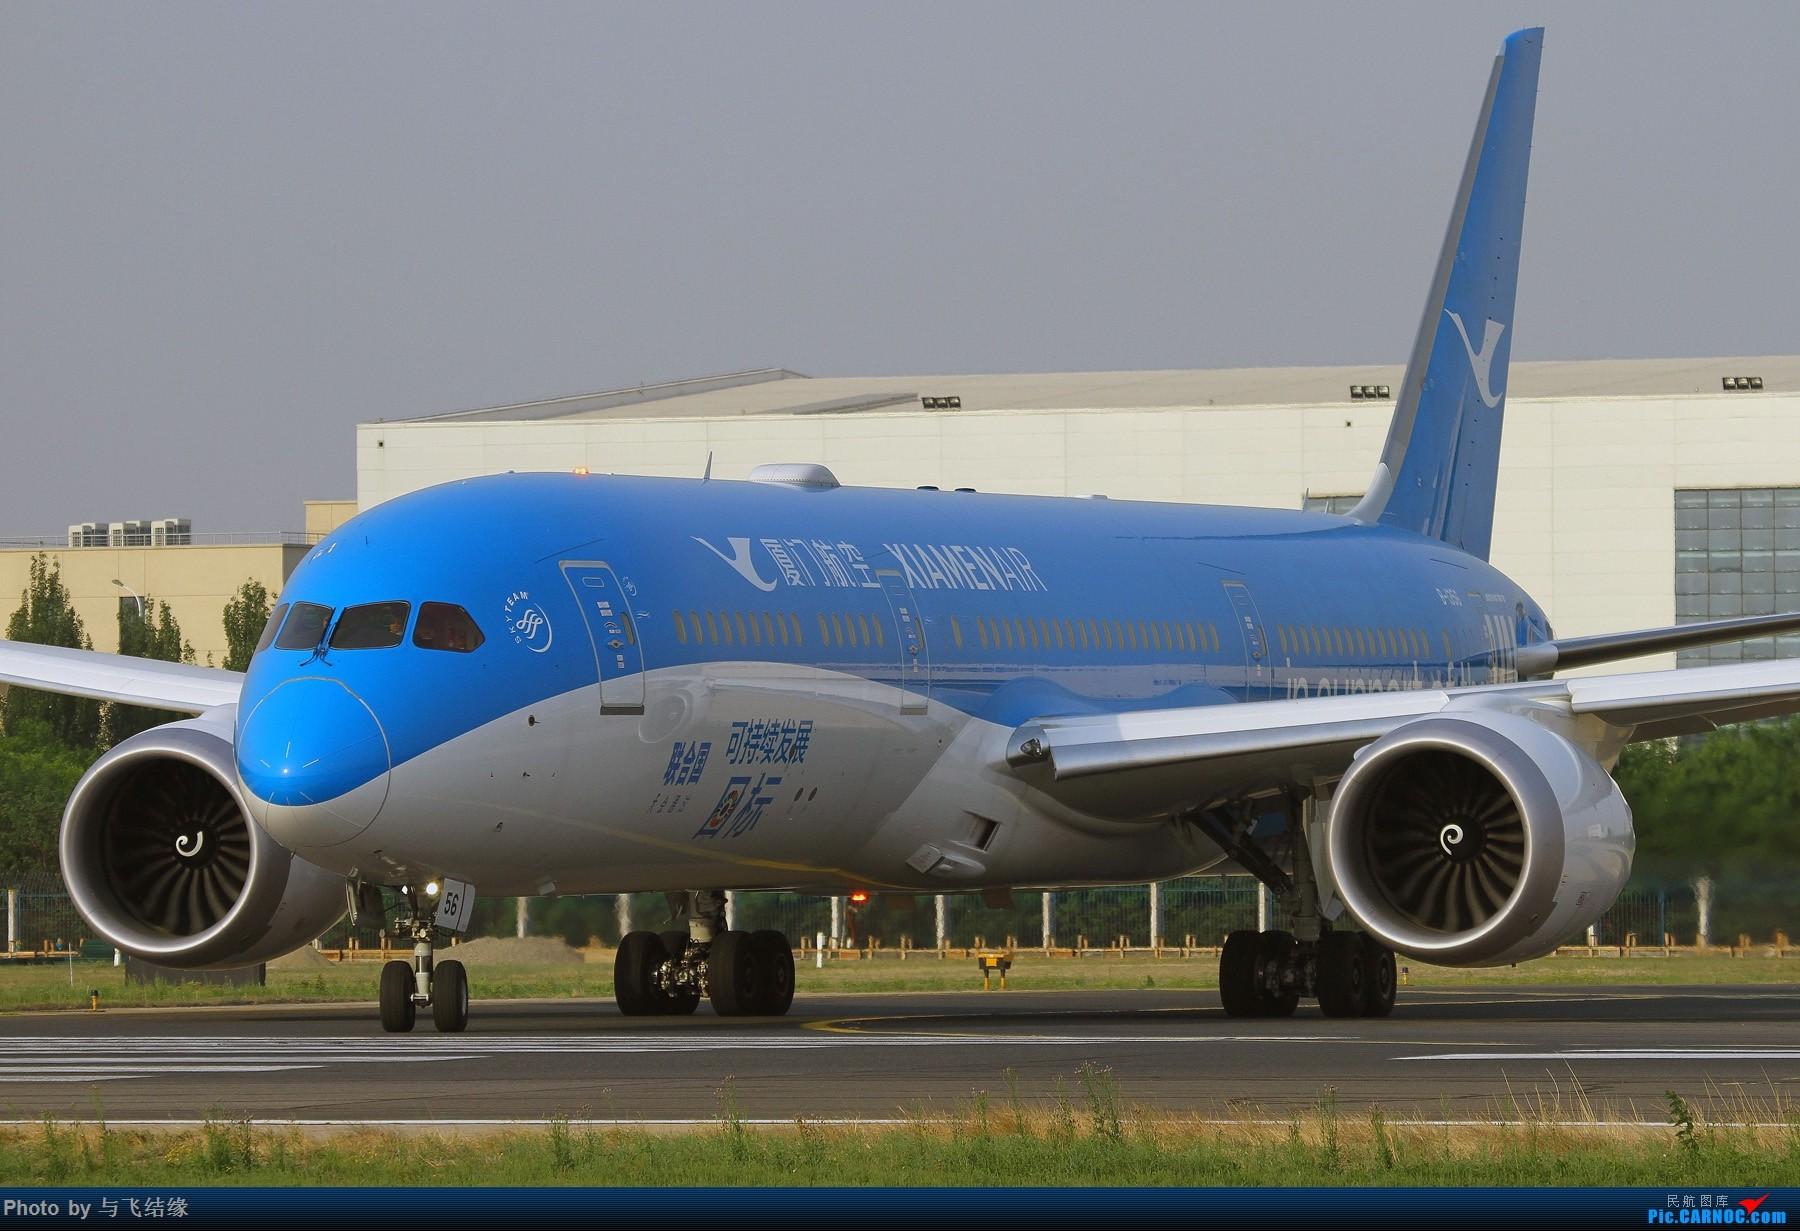 "Re:[原创]厦门航空联合国""可持续发展""彩绘boeing 787-9组图! BOEING 787-9 B-1356 中国北京首都国际机场"